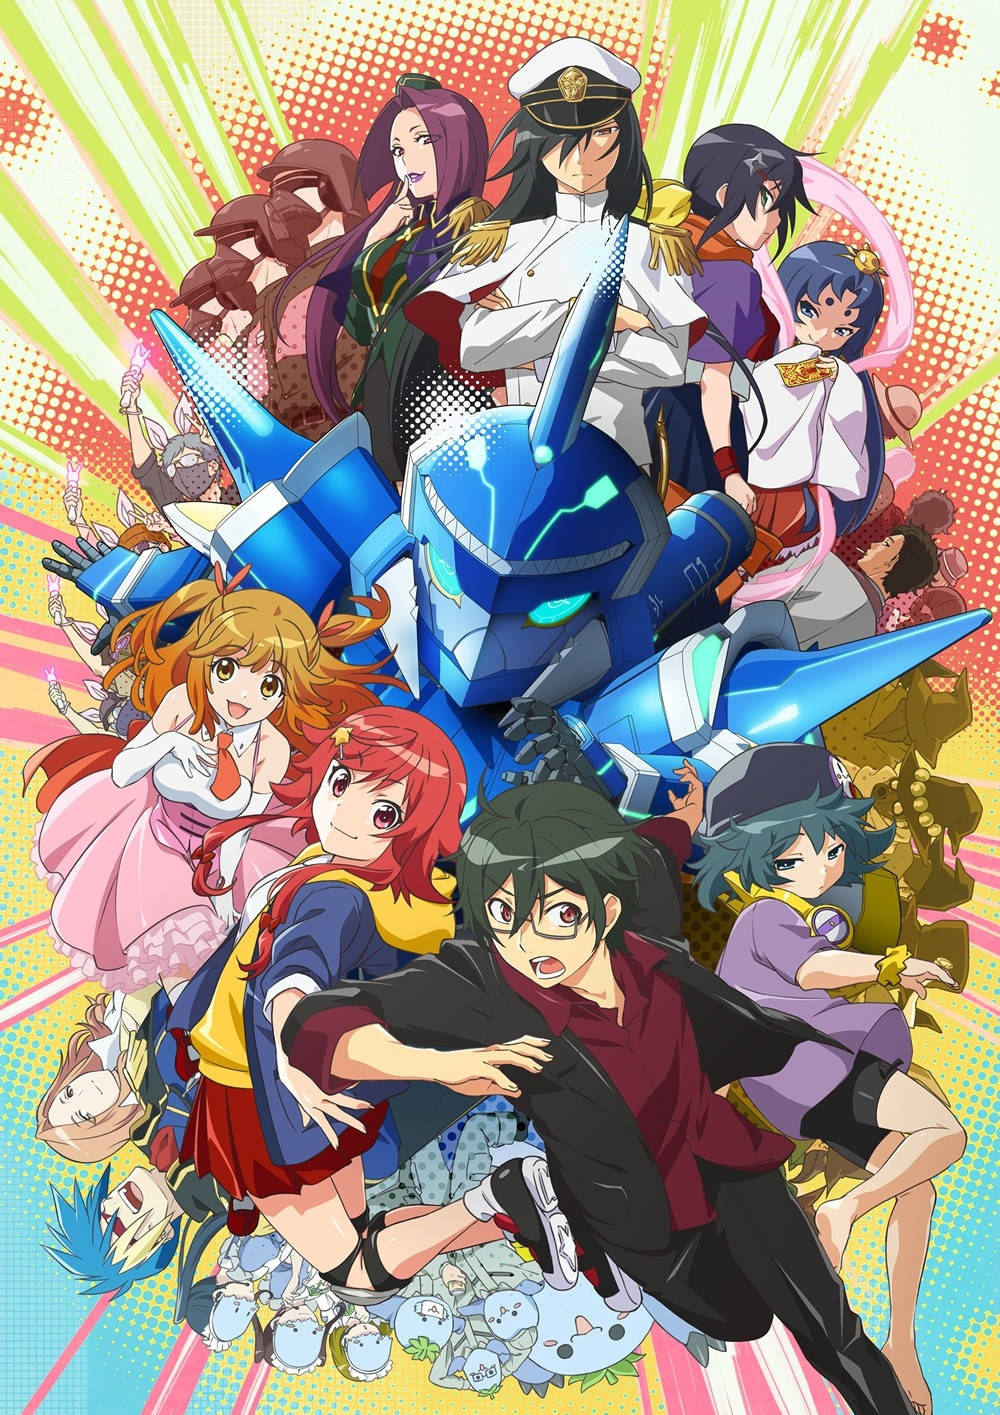 El anime original Gyakuten Sekai no Denchi Shoujo revela un nuevo video promocional